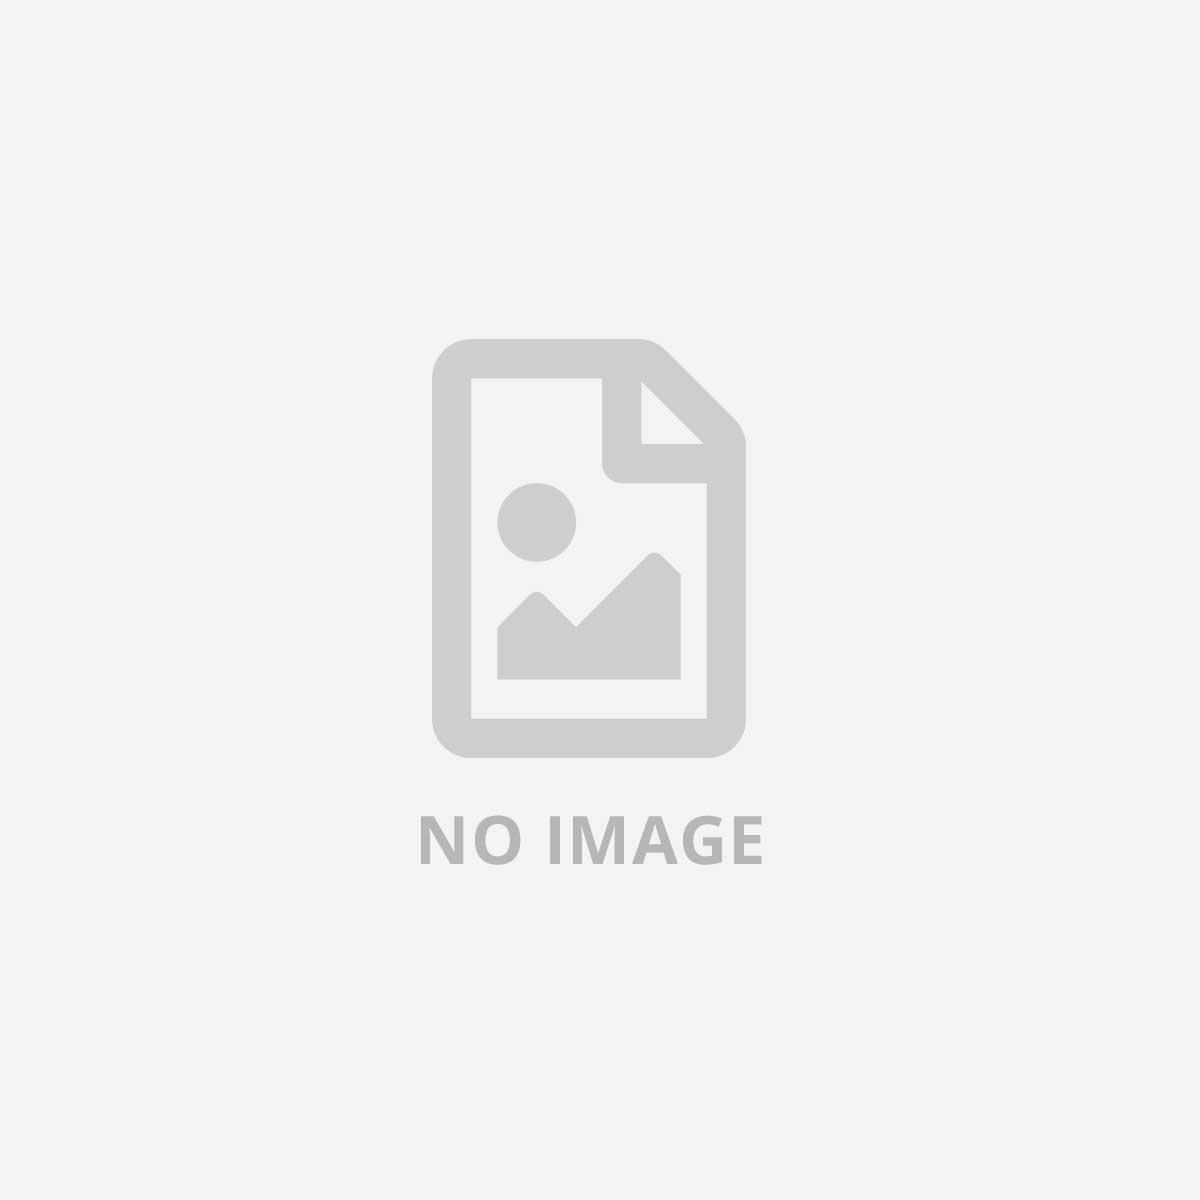 DYMO CUSTODIA TRASP RIGIDA PER RHINO5200